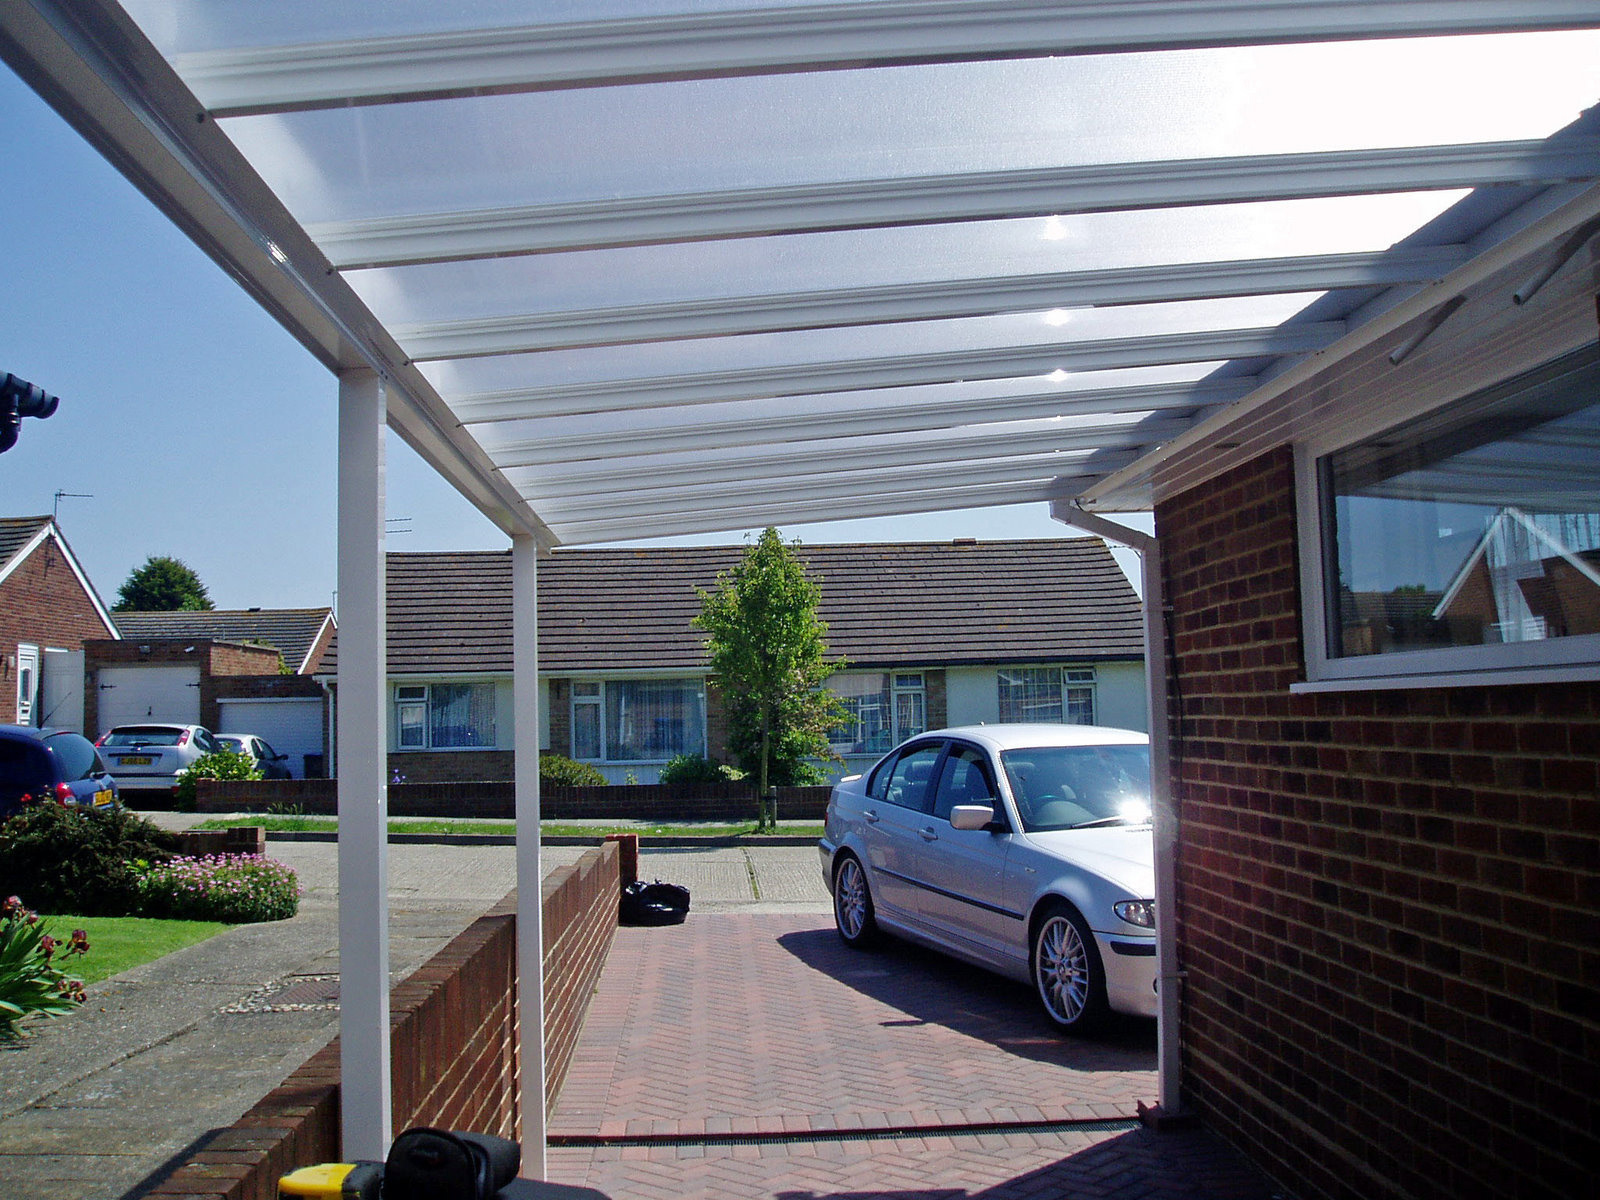 Quality Canopies - carports verandas covered walkways ...